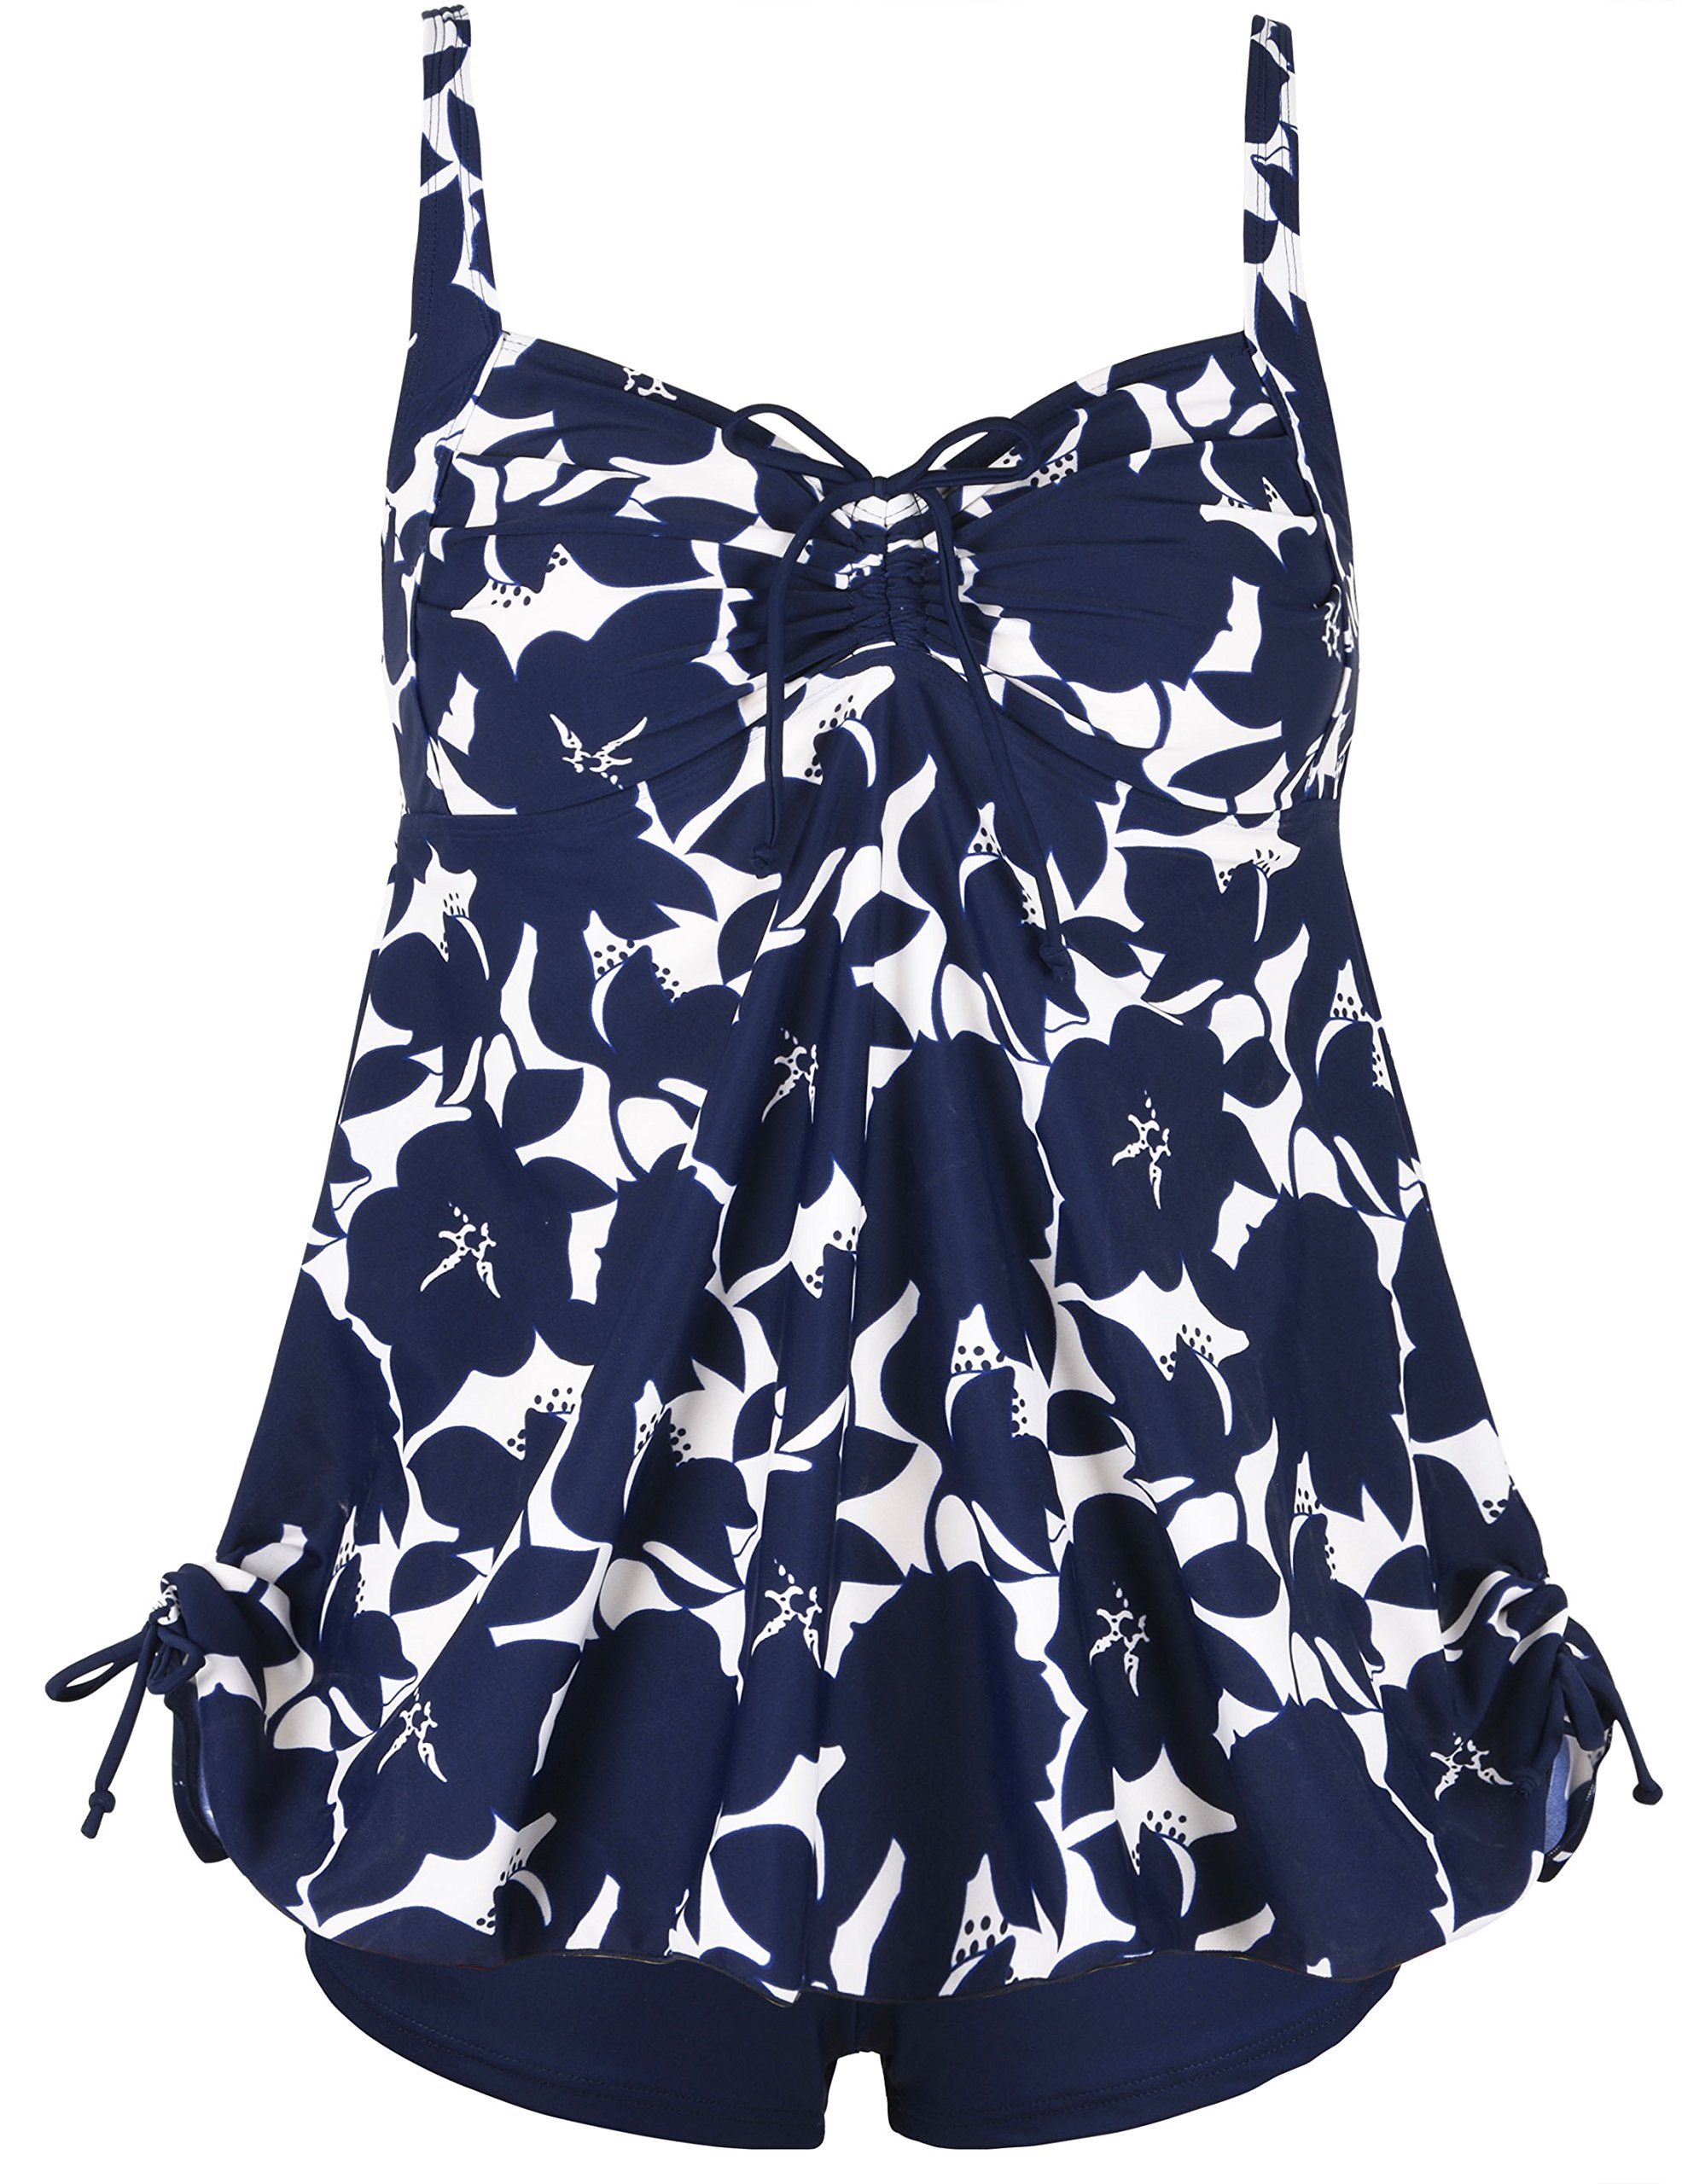 Septangle Women's Plus Size Bathing Suits Ruffle Two Piece Floral Print Tankini (Blue,US 18)